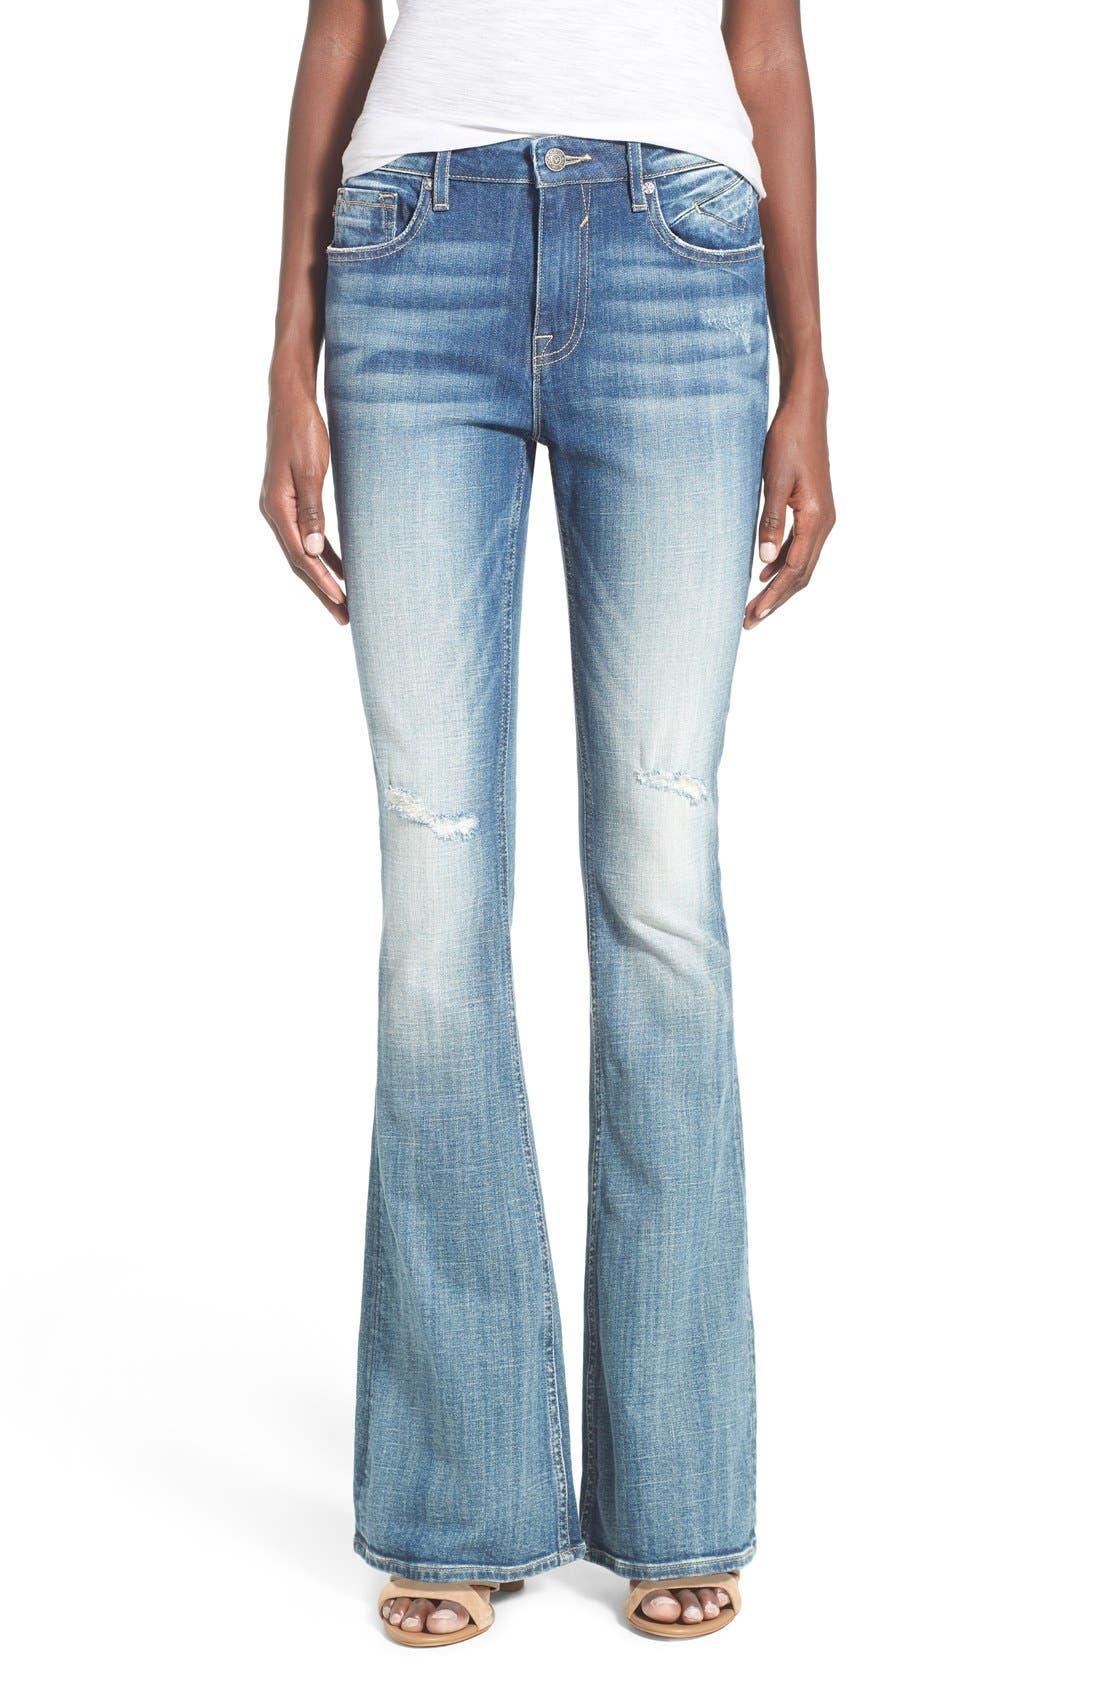 Main Image - Vigoss 'Chelsea' Flare Jeans (Medium Wash)